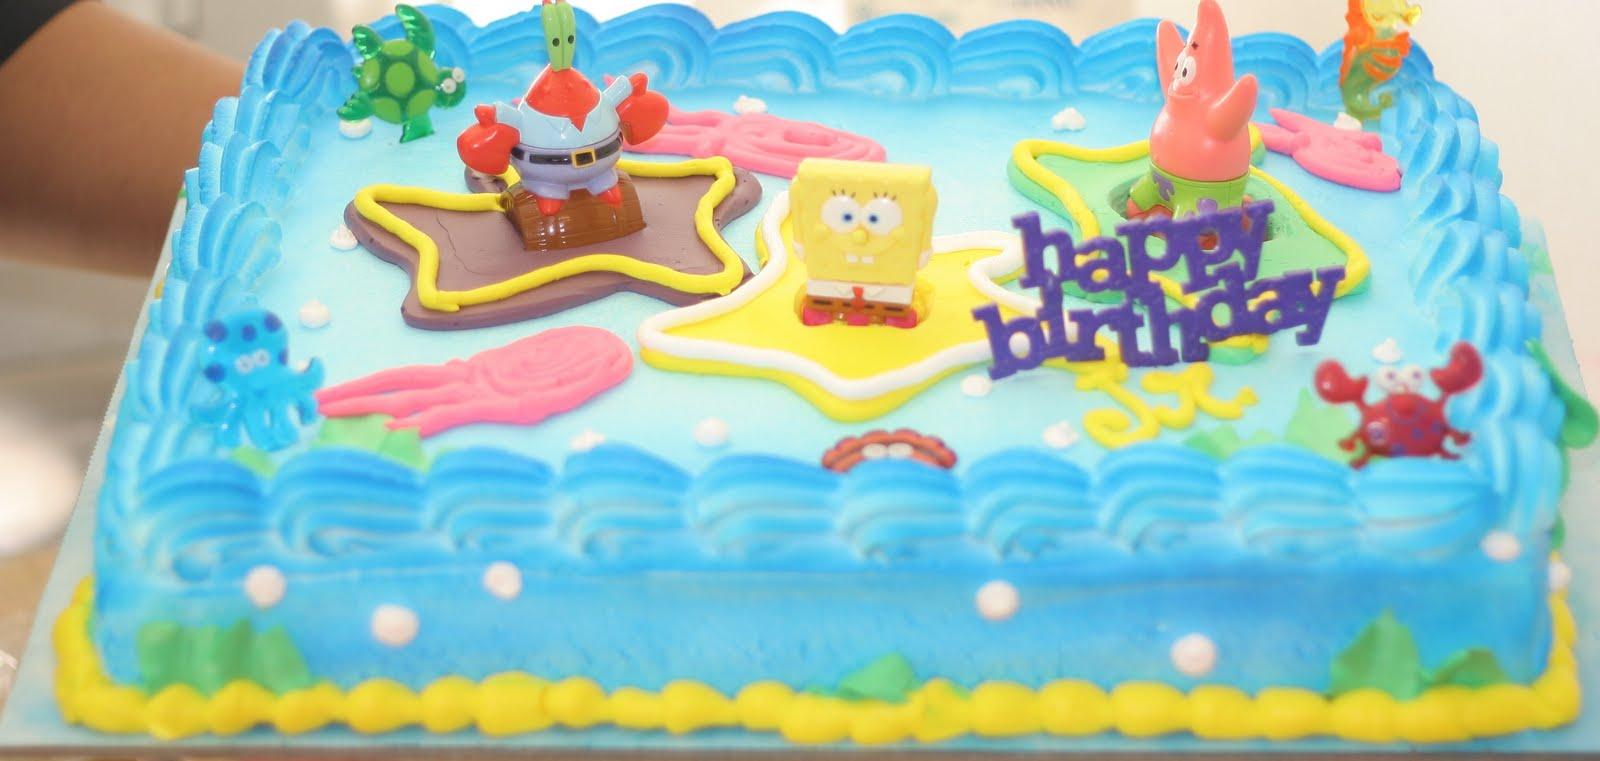 Hectors Custom Cakes SPONGEBOB CAKE